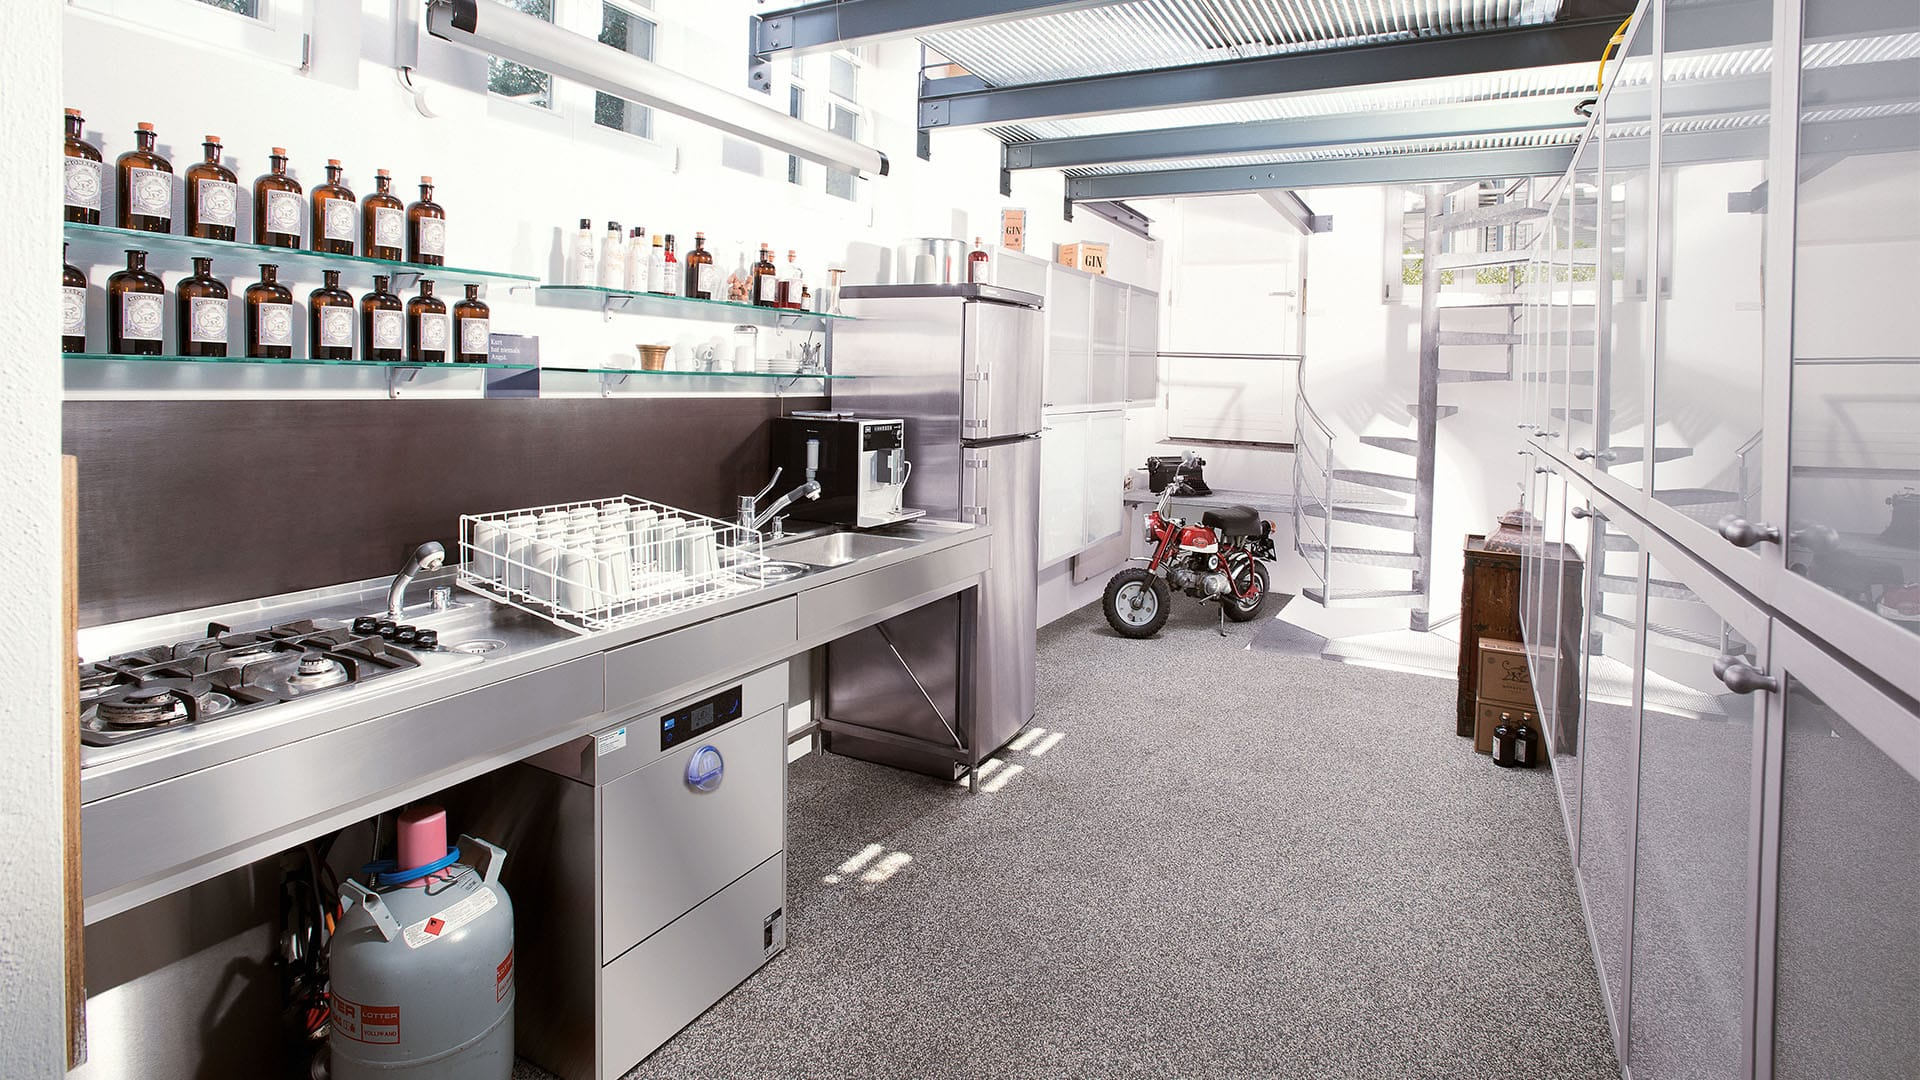 Commercial dishwashers, bedpan washers - MEIKO